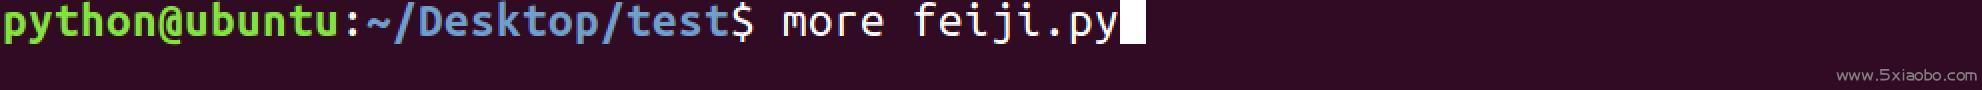 认识Linux命令--文件、磁盘管理  Linux 命令 第9张